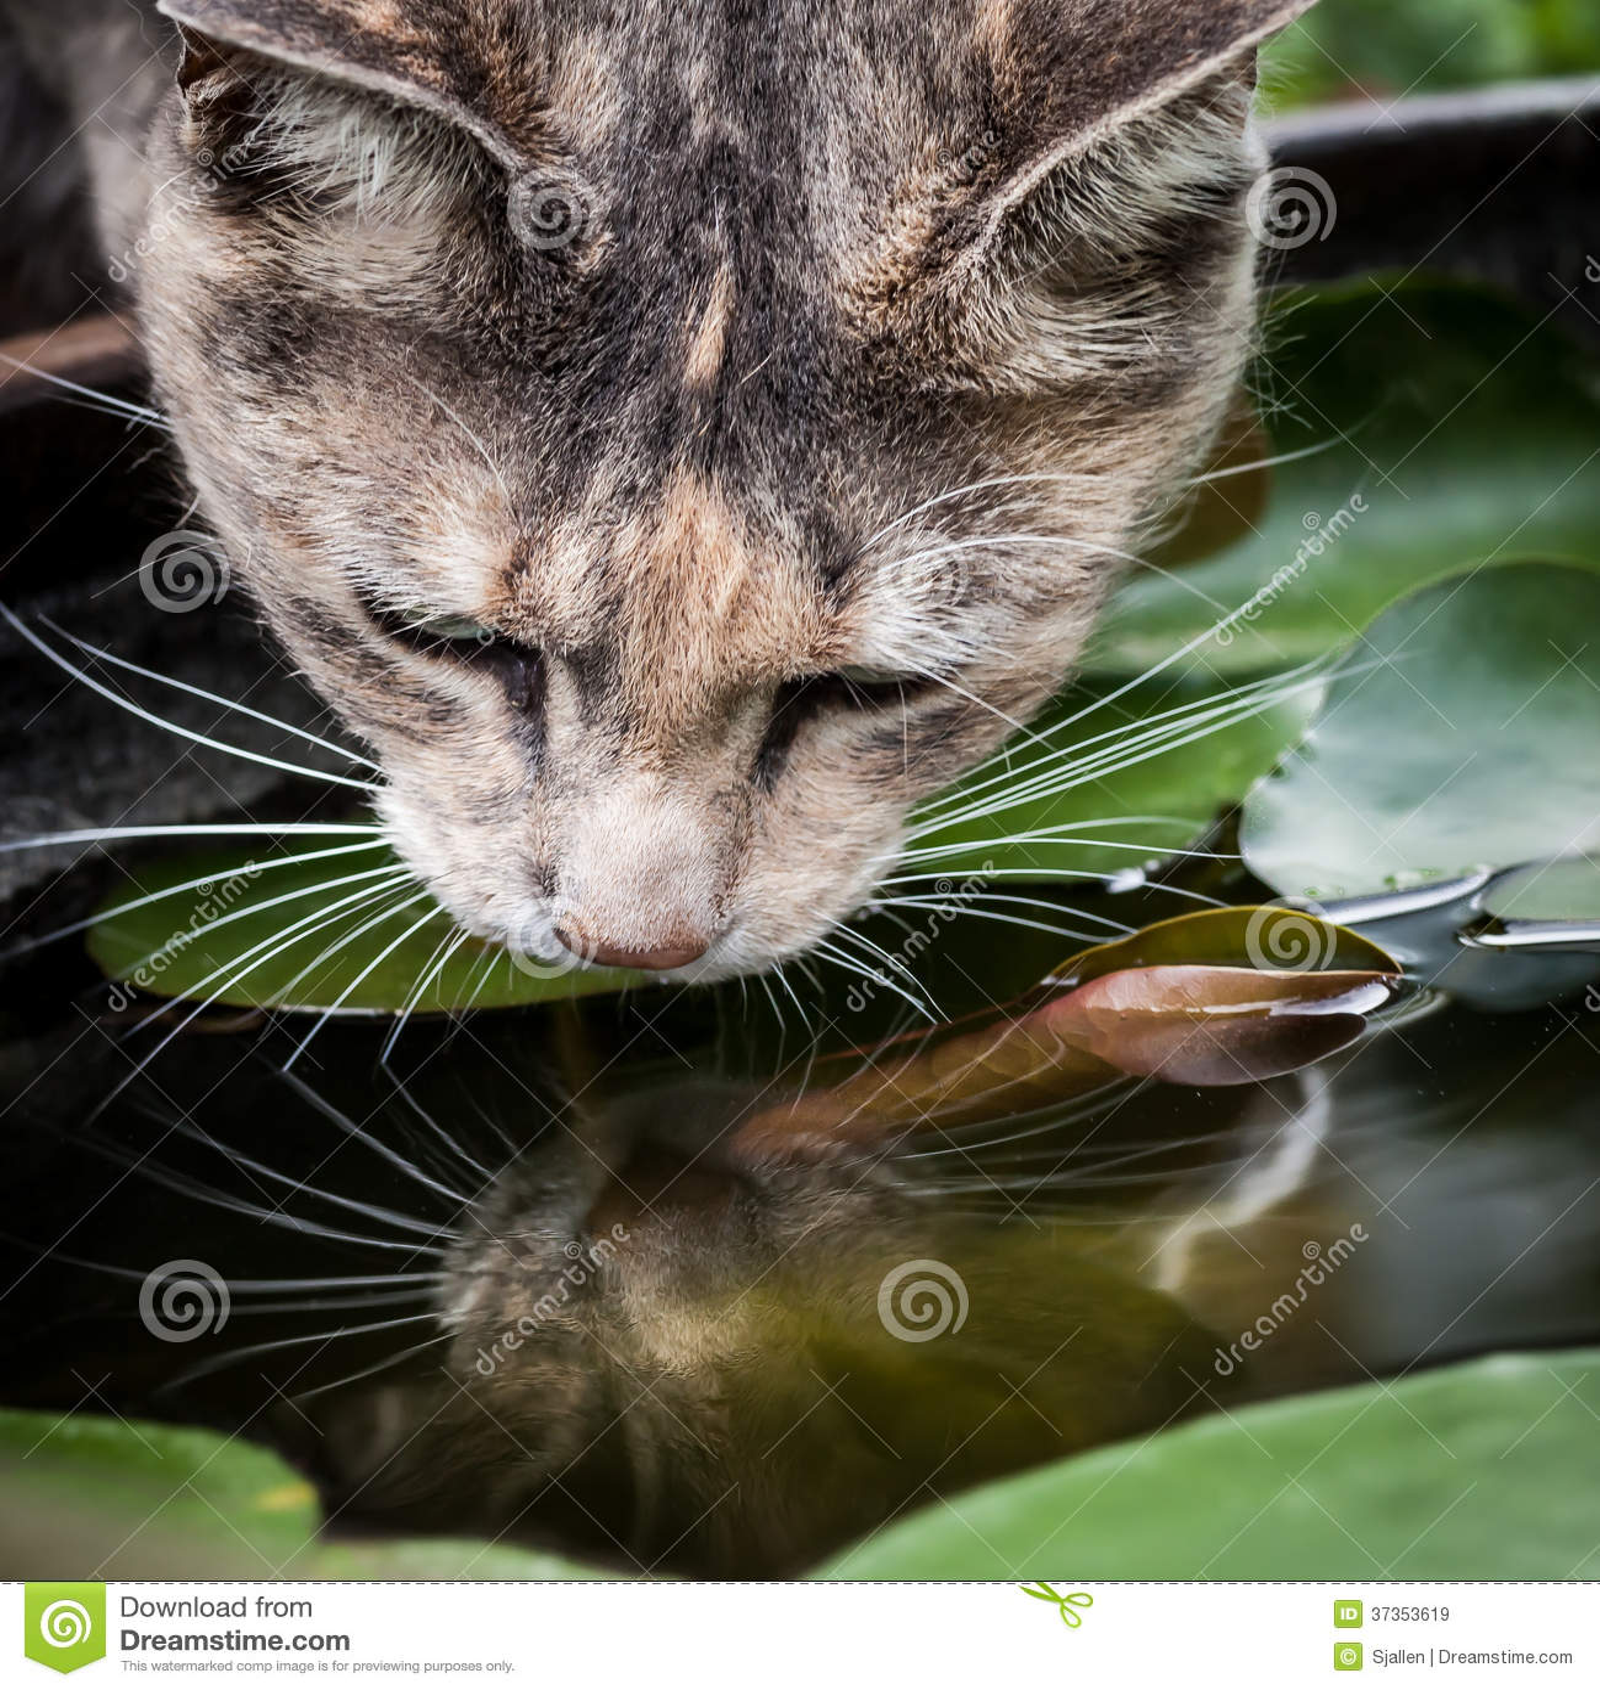 Tortoiseshell-Tabby Cat Drinking from Fish Bowl